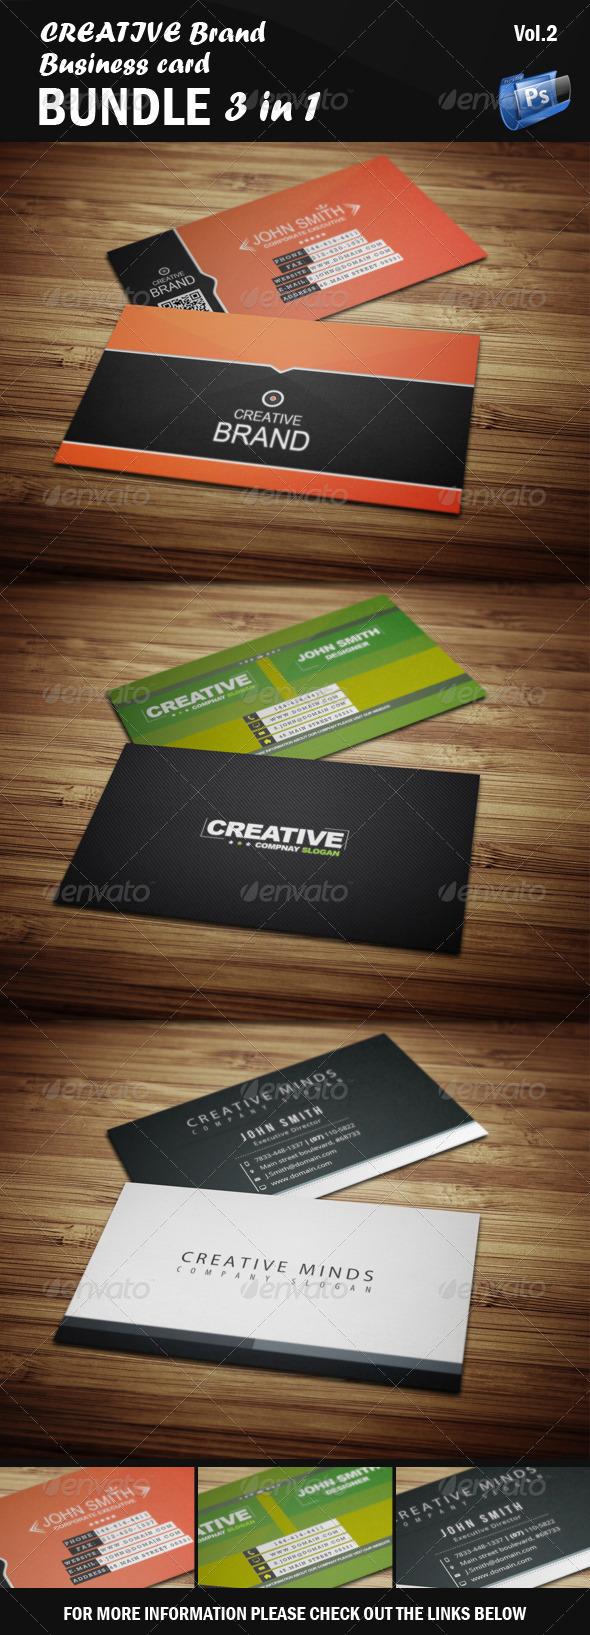 GraphicRiver Creative Business Card Bundle 3 in 1 [Vol.2] 6404745